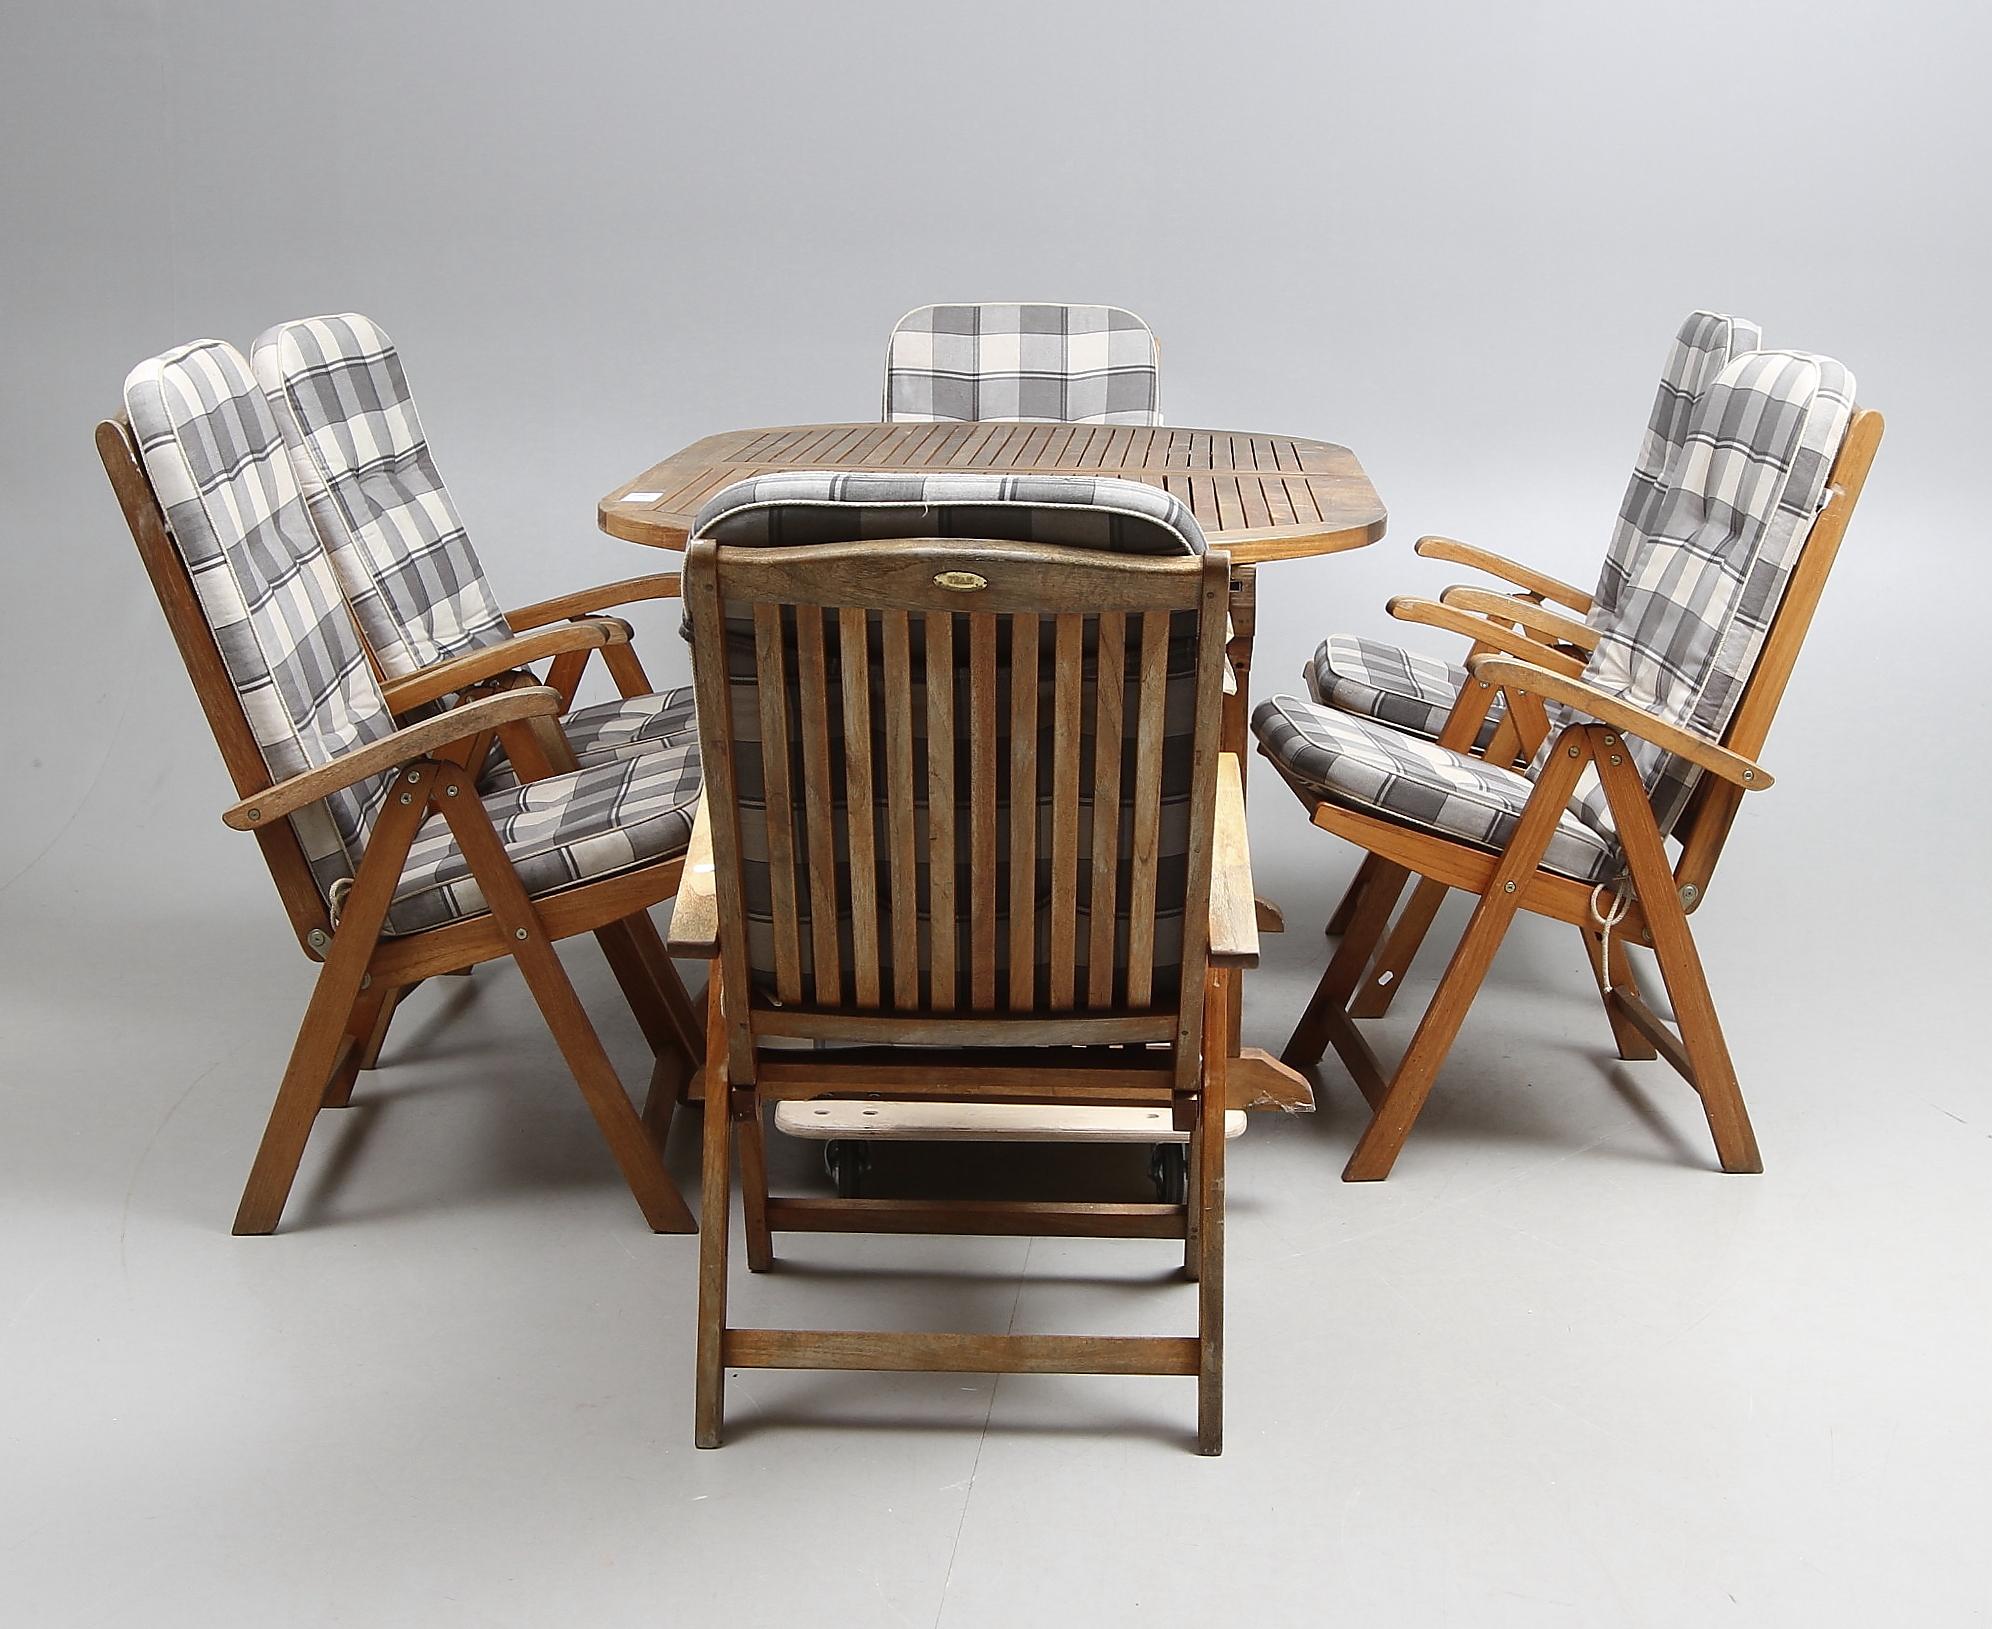 Tradgardsmobler Teak 7 Delar Samt Stolsdynor Furniture Garden